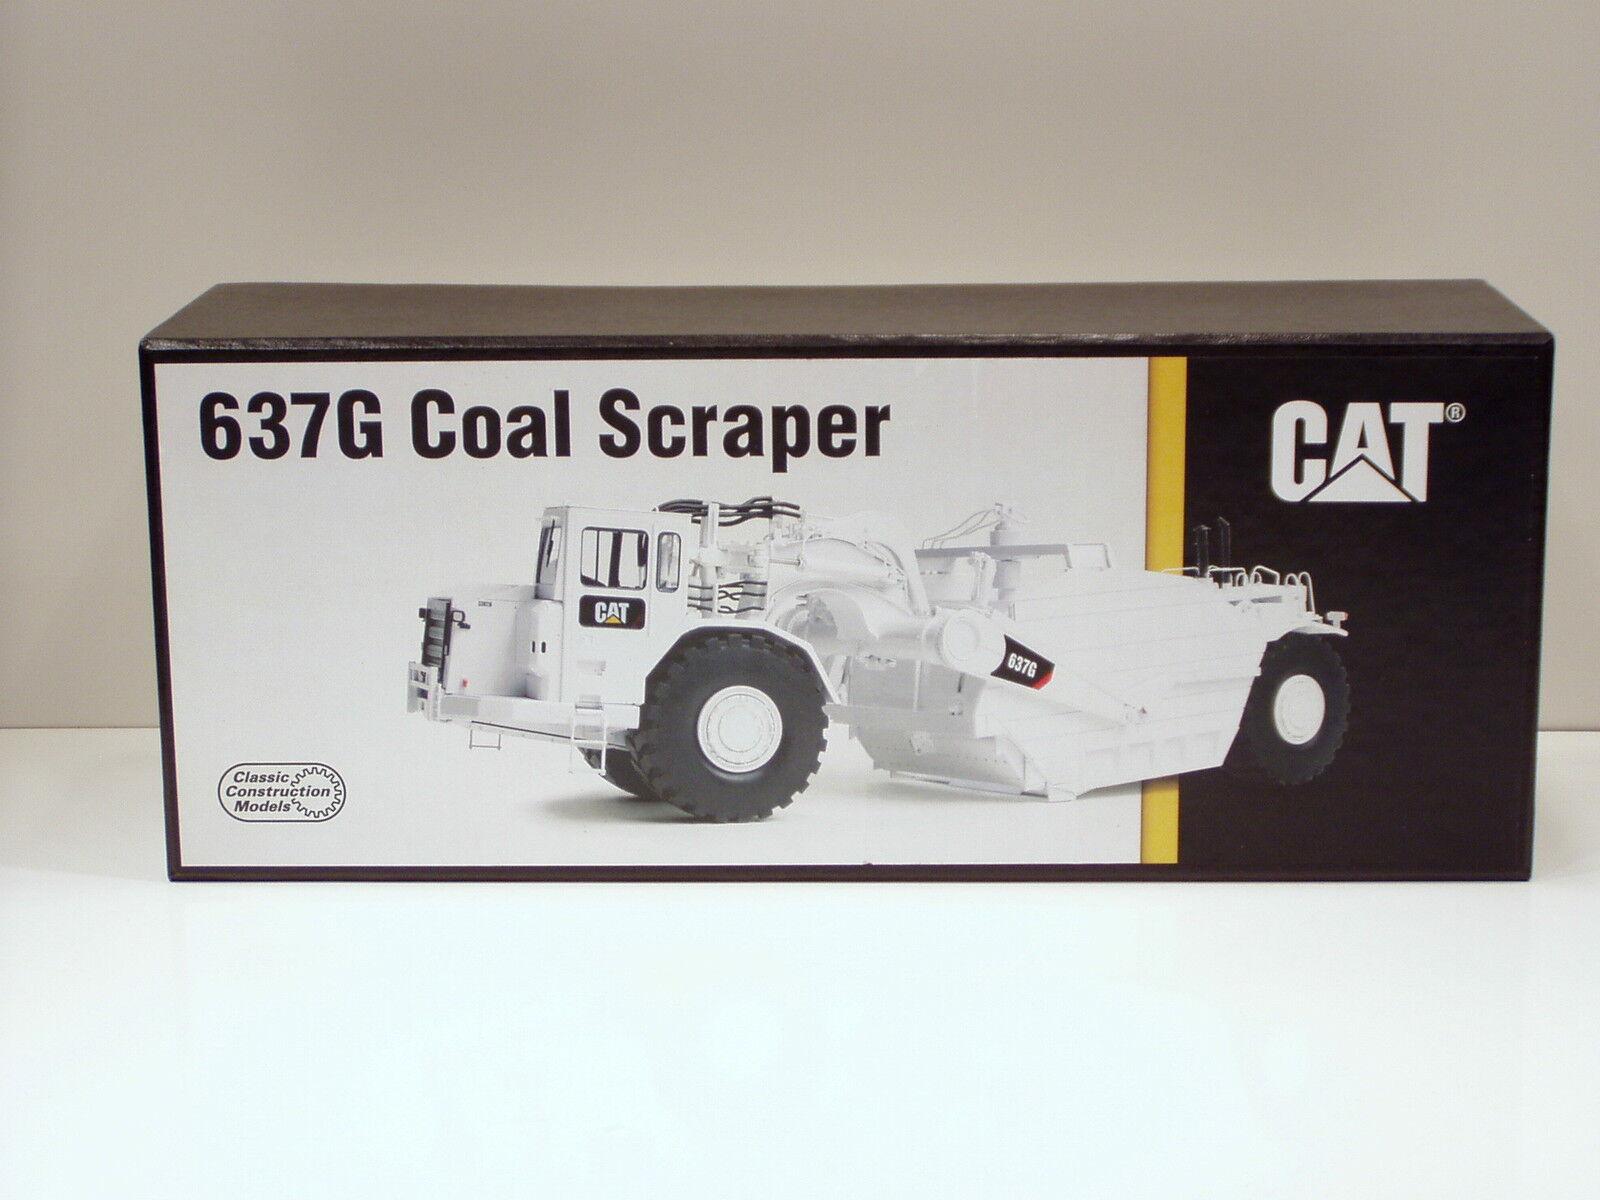 Caterpillar 637 G Charbon Grattoir avec Auger -  BLANC  - 1 48 - CCM-Laiton-Comme neuf IN BOX